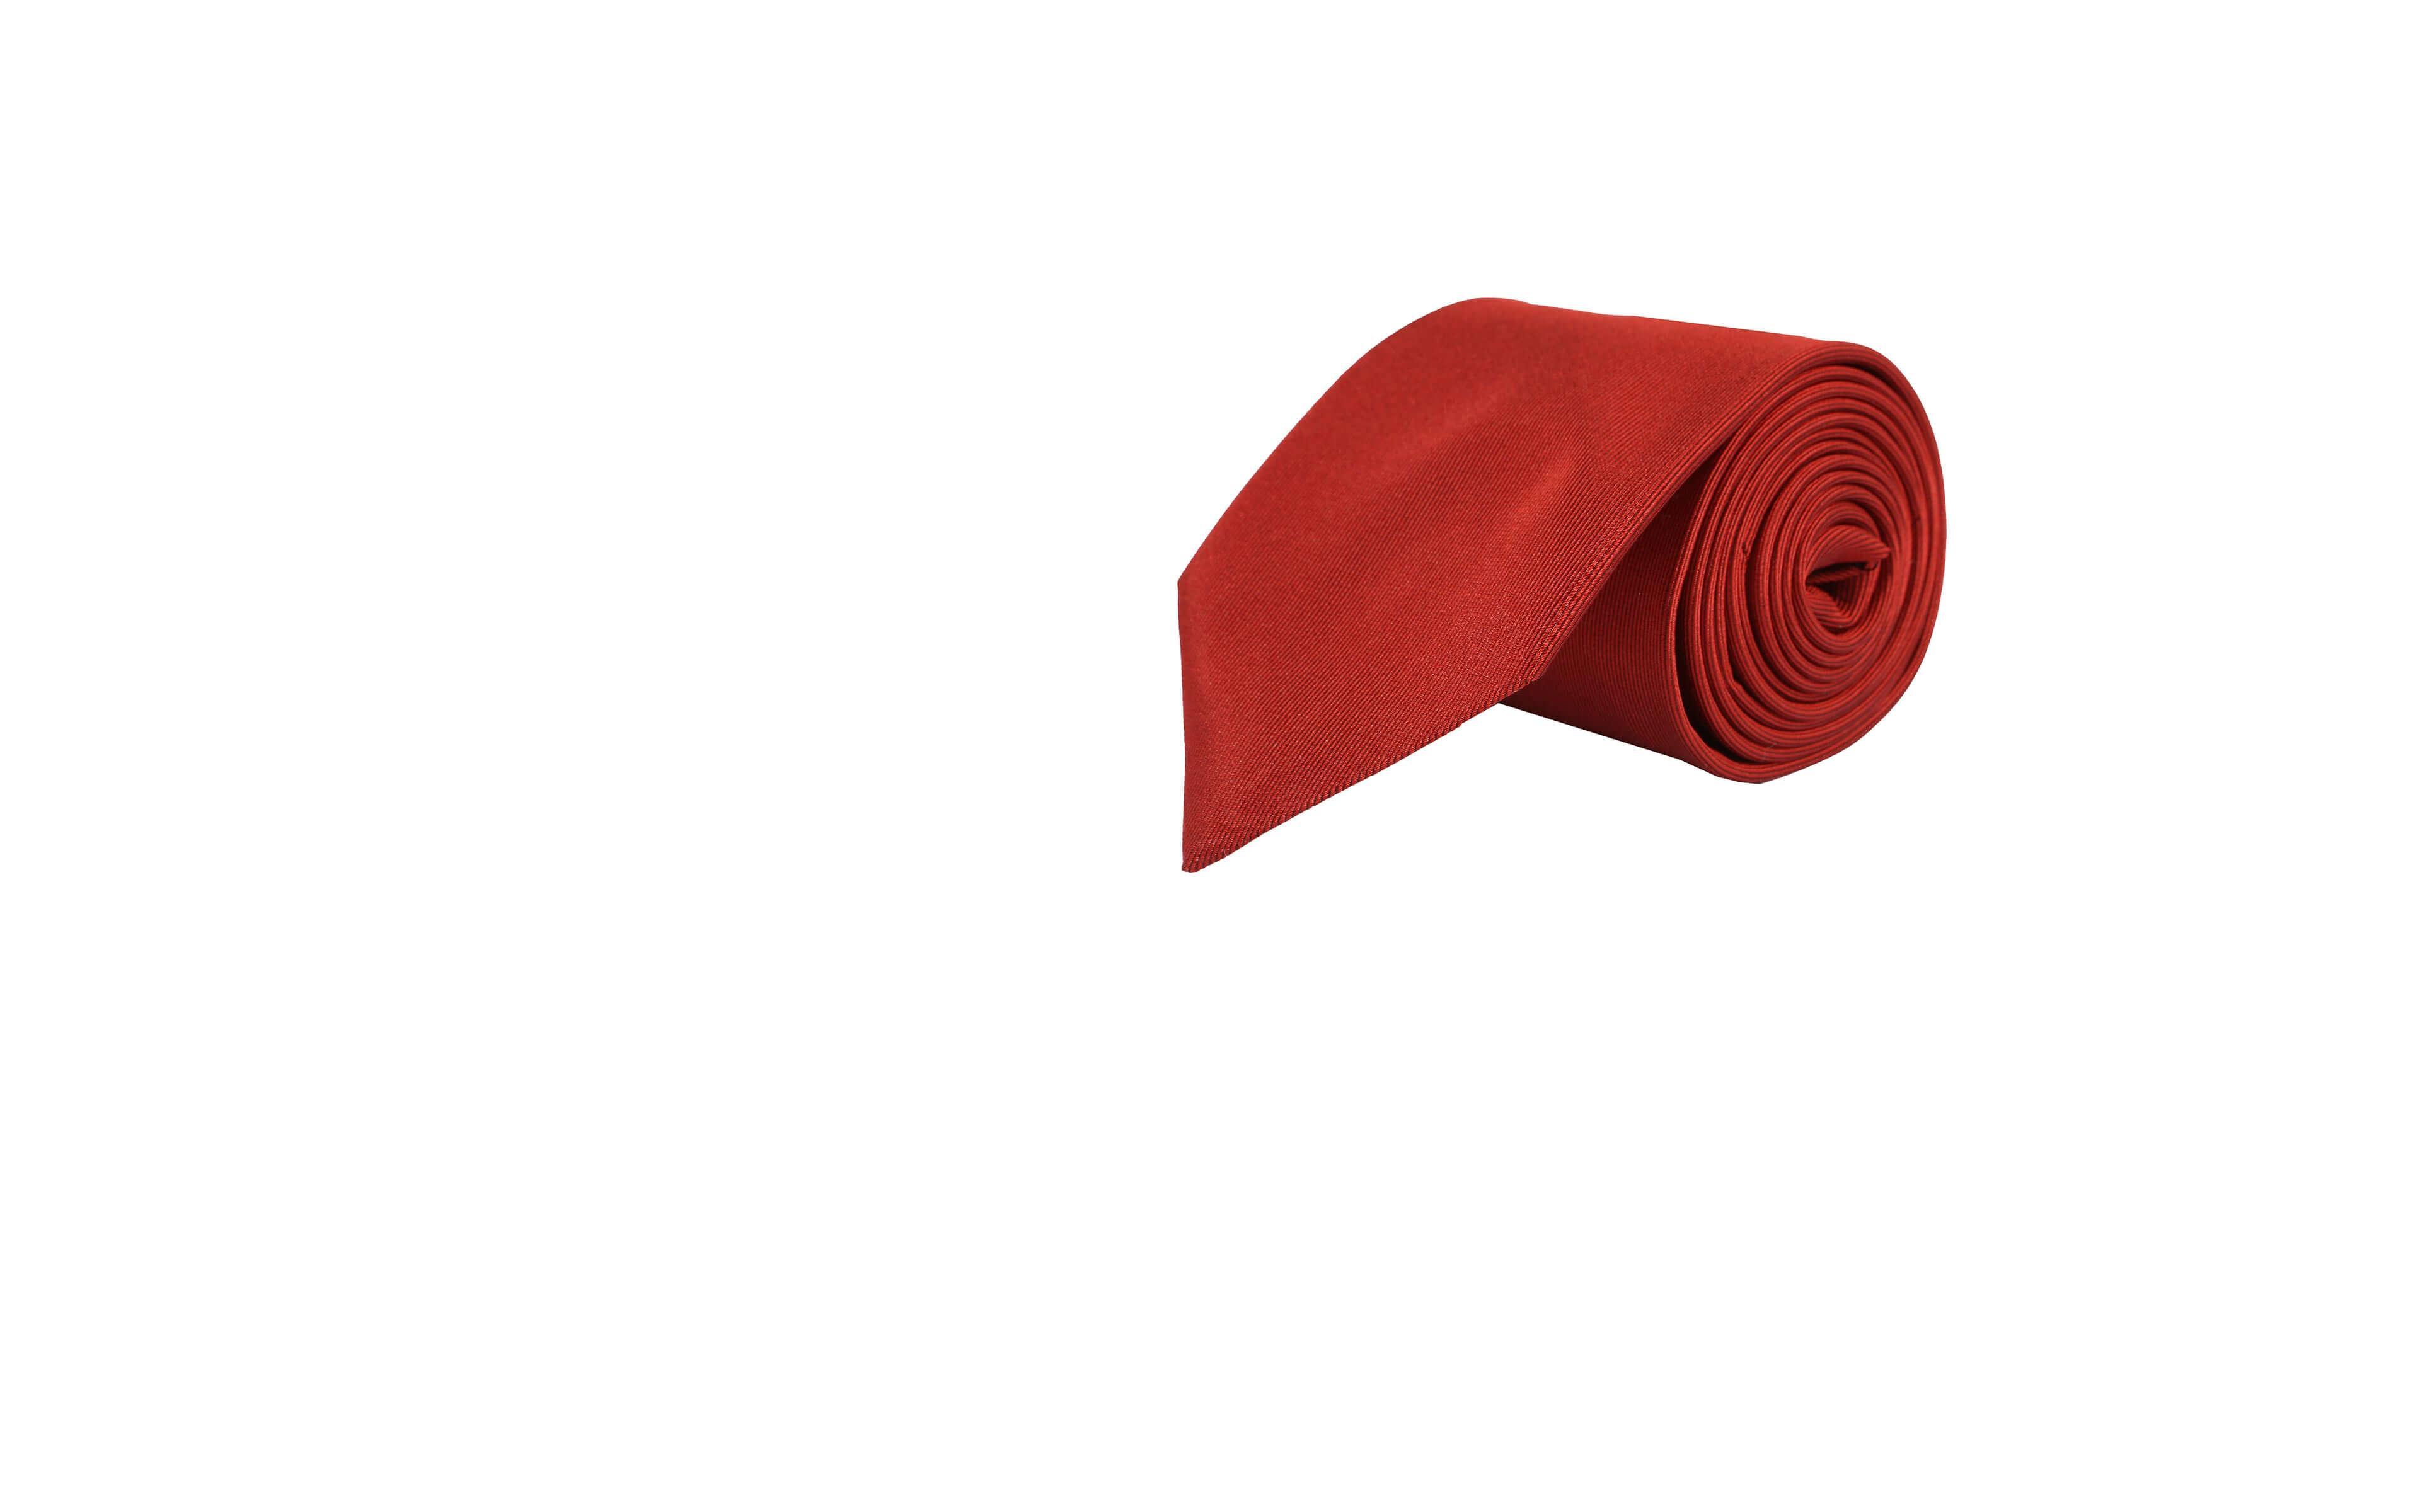 Solid Copper Silk Tie